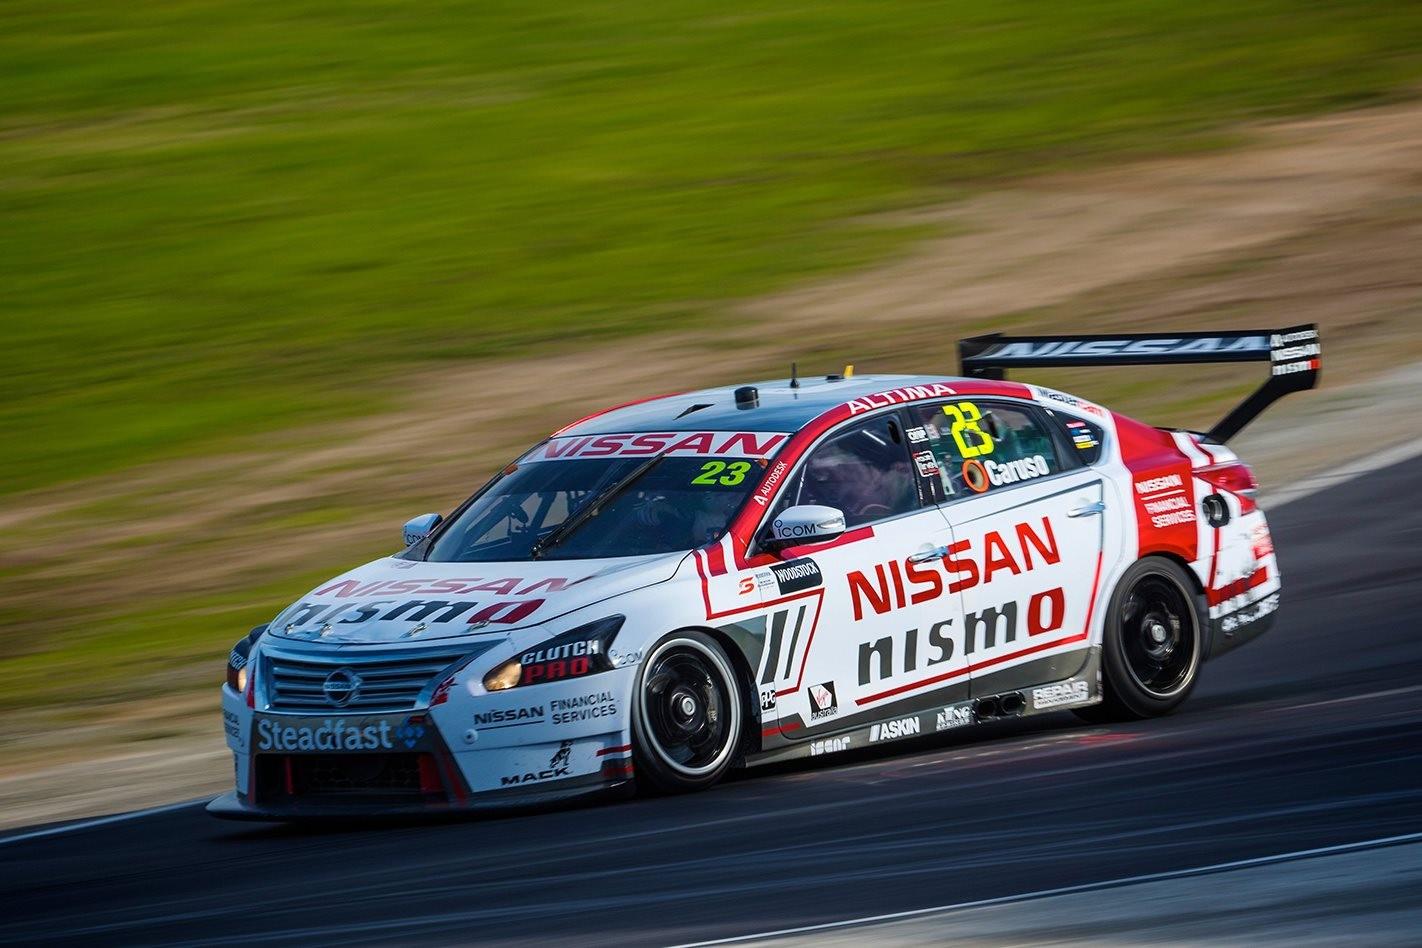 Nissan Altima racing at track